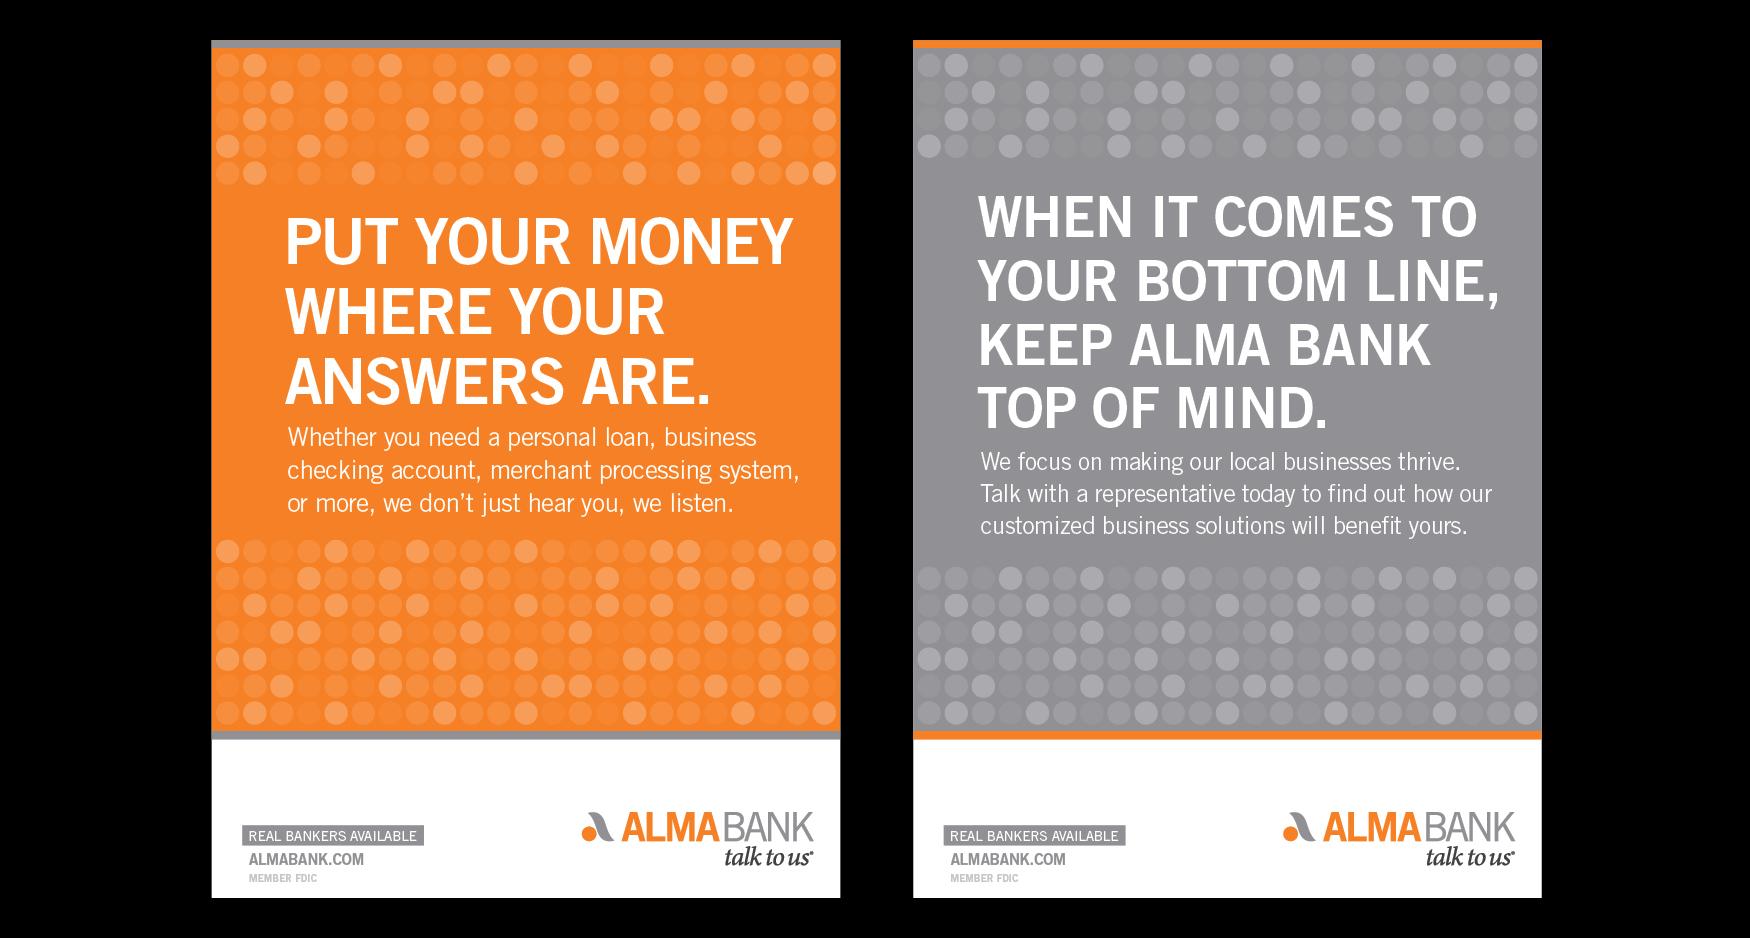 Hi Resolution Artwork4 - ALMA BANK - TALK TO US CAMPAIGN